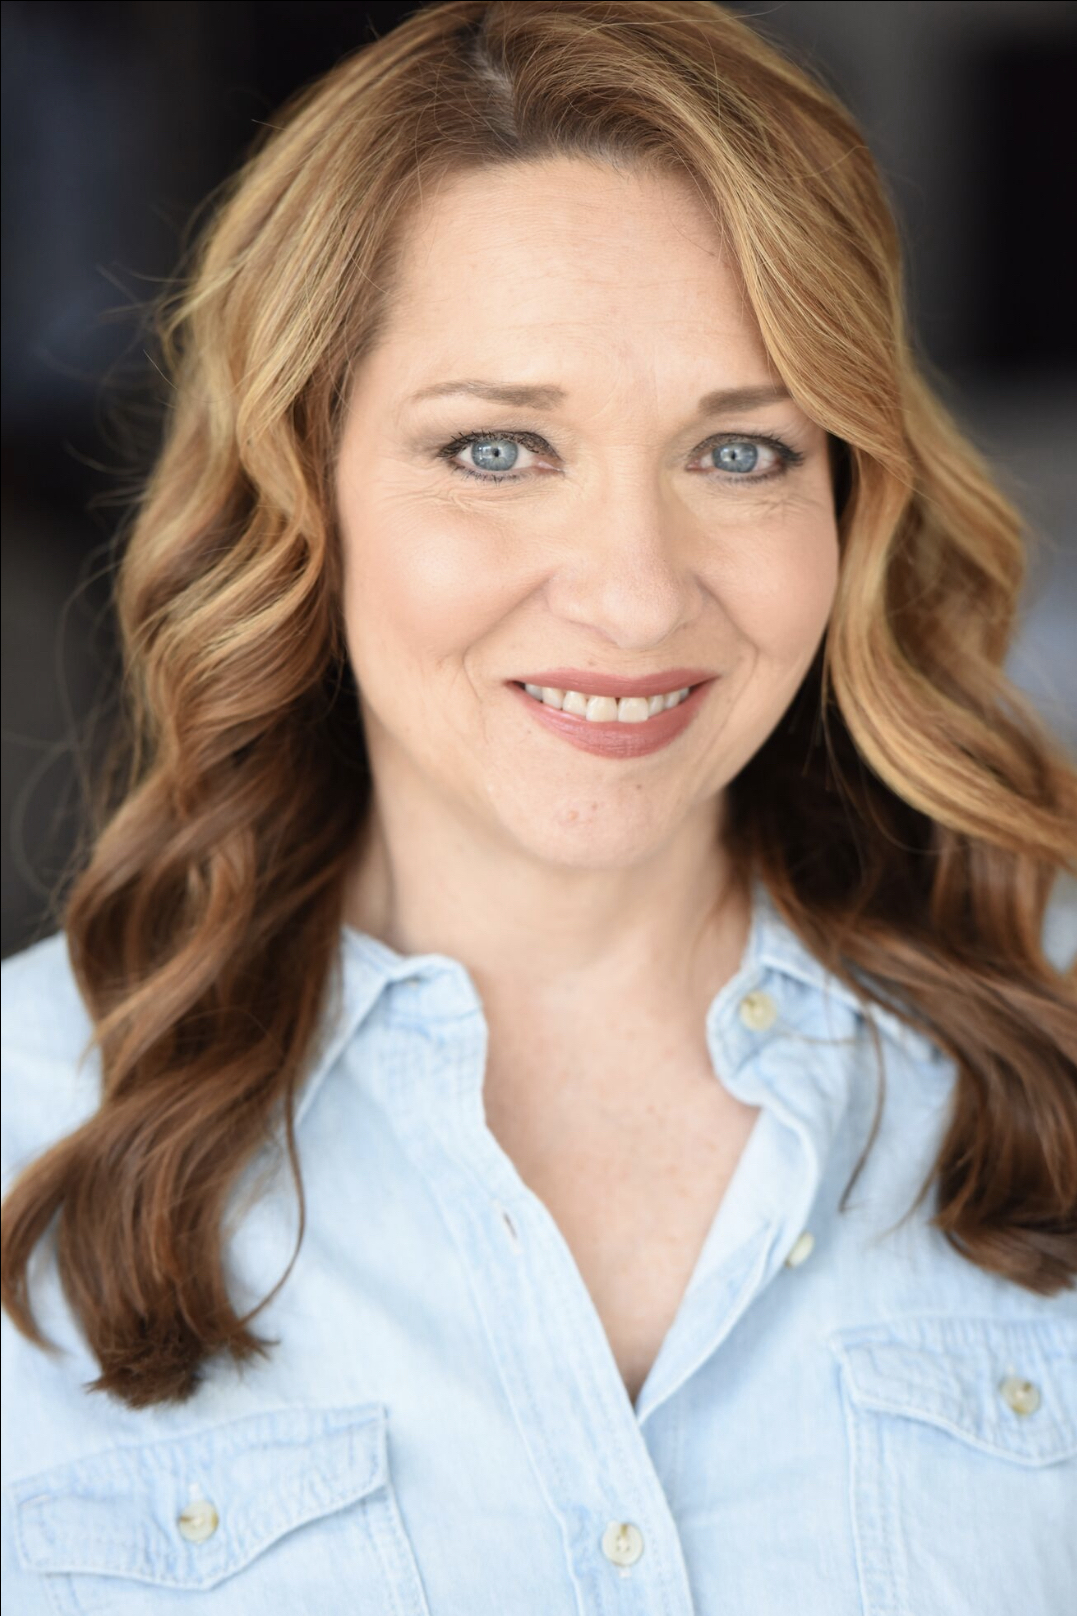 Laura Stisser